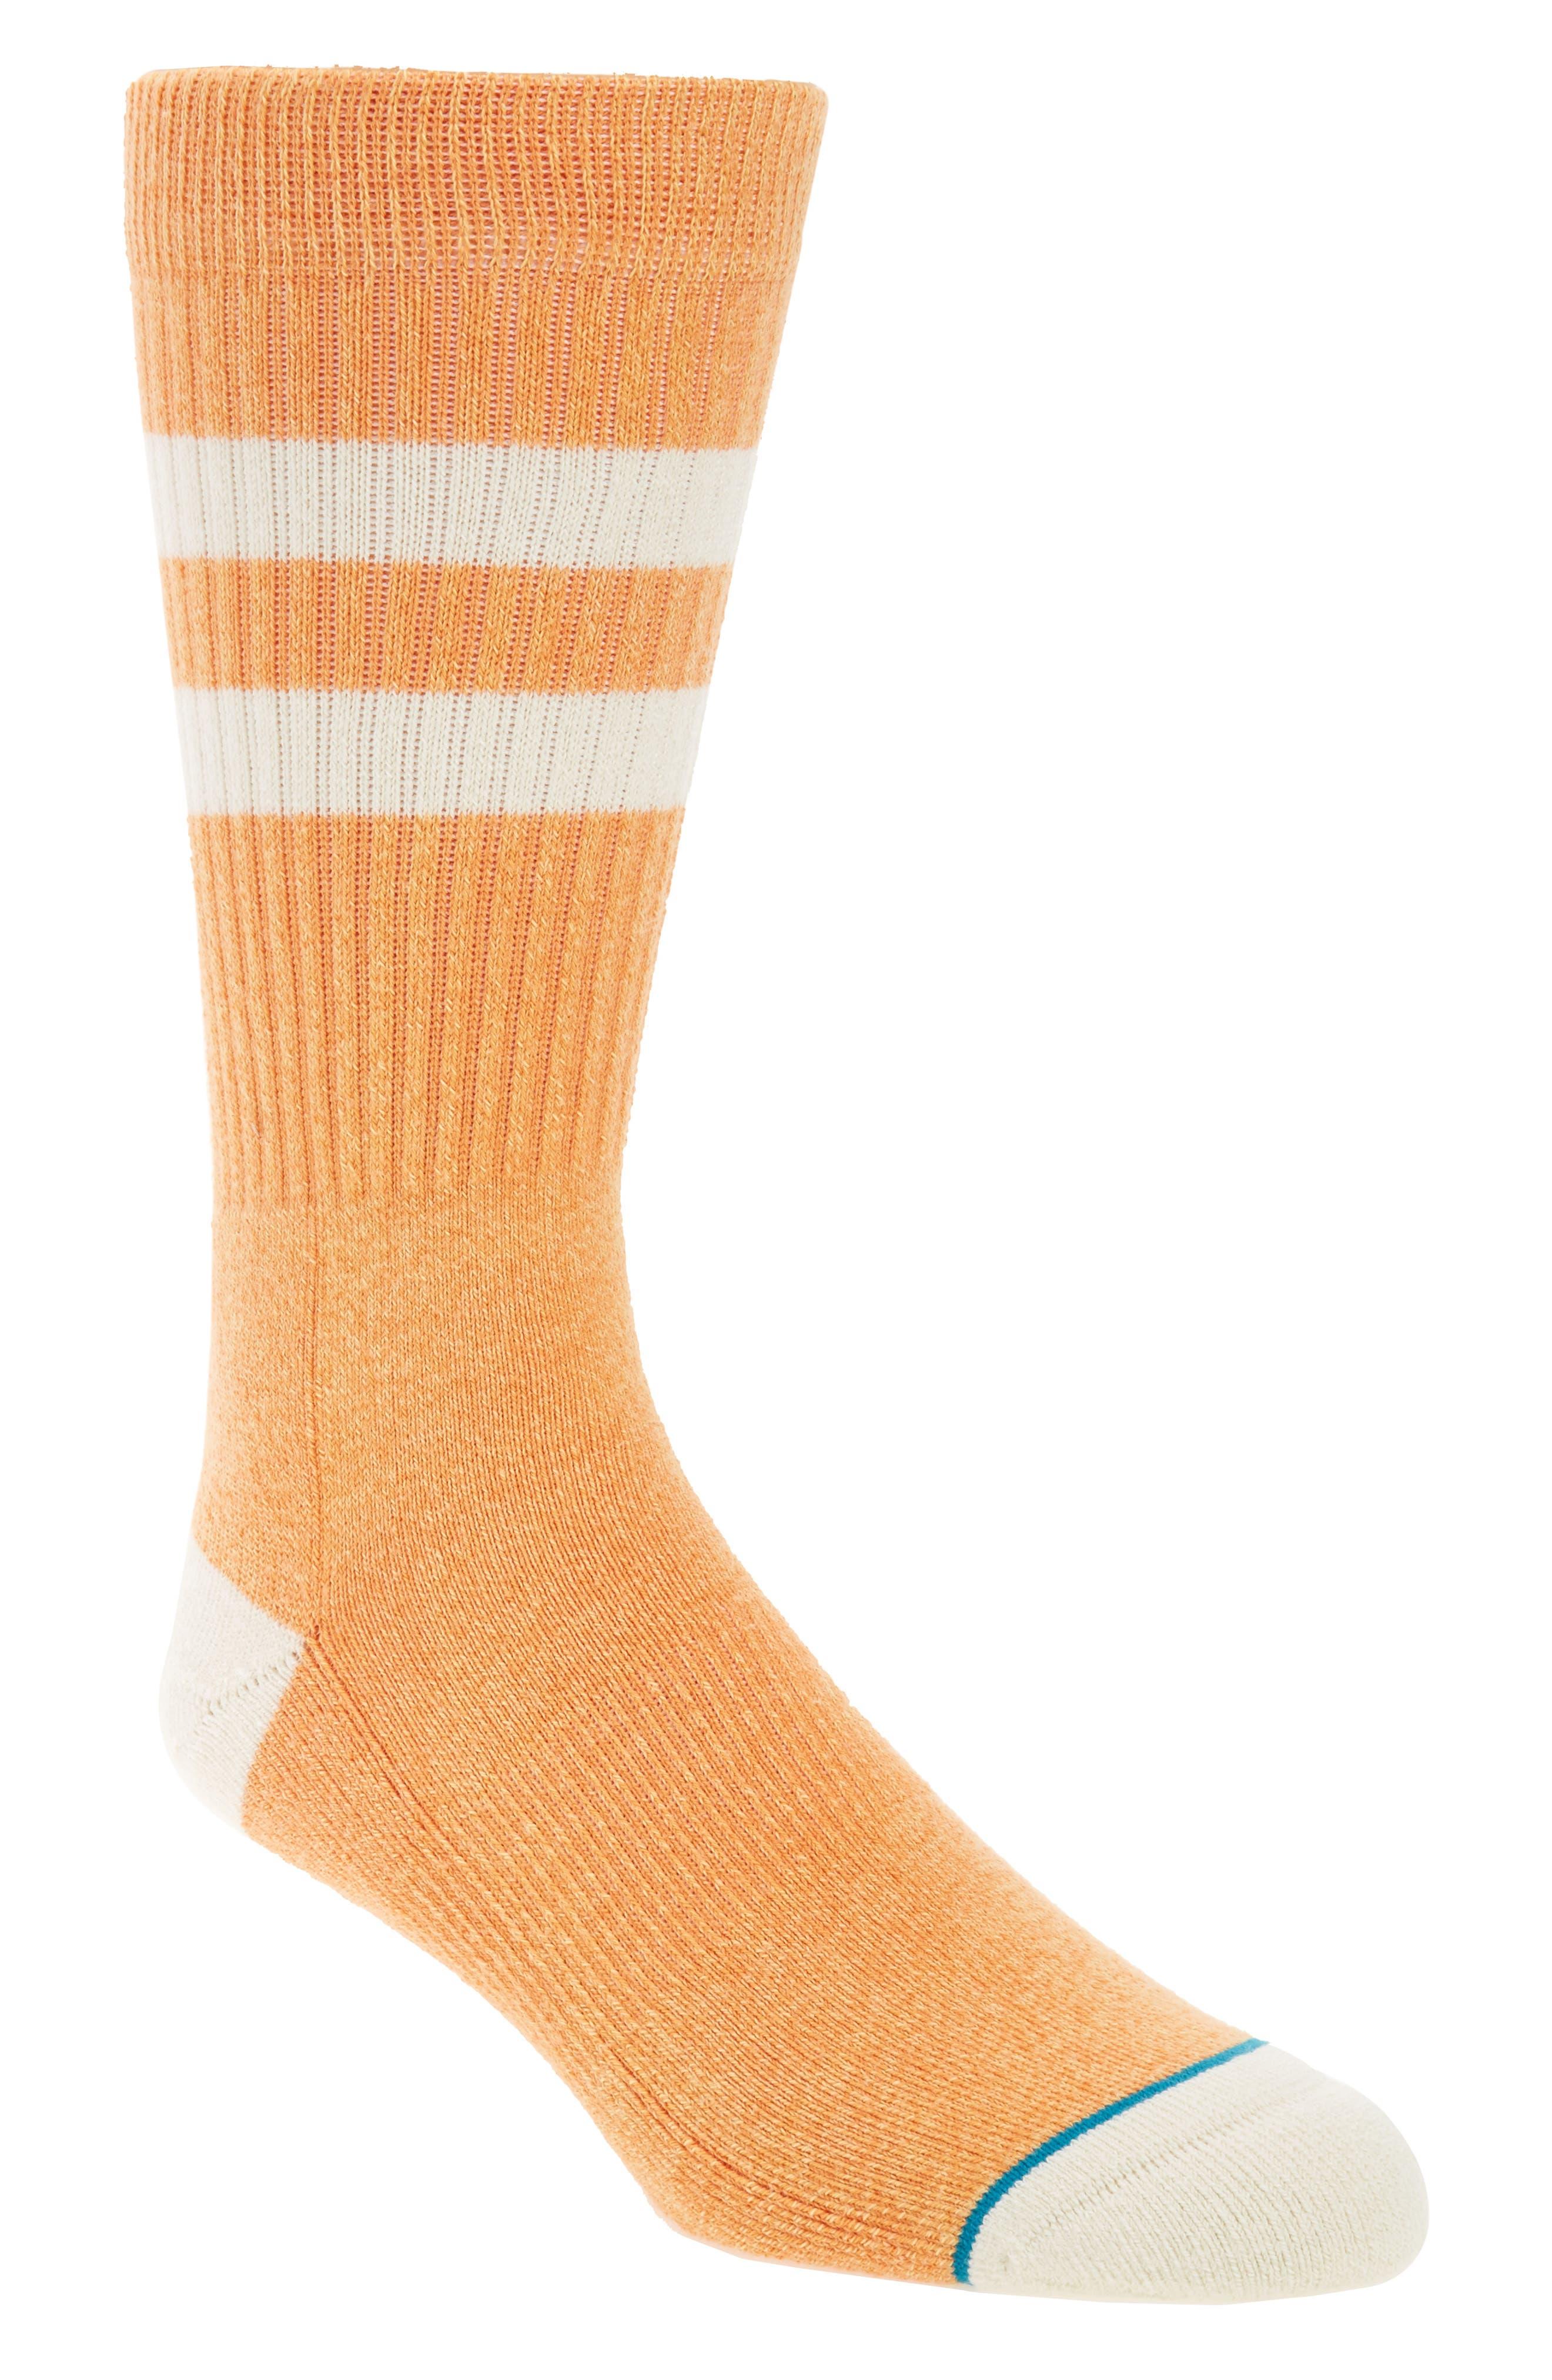 Main Image - Stance Salty Crew Socks